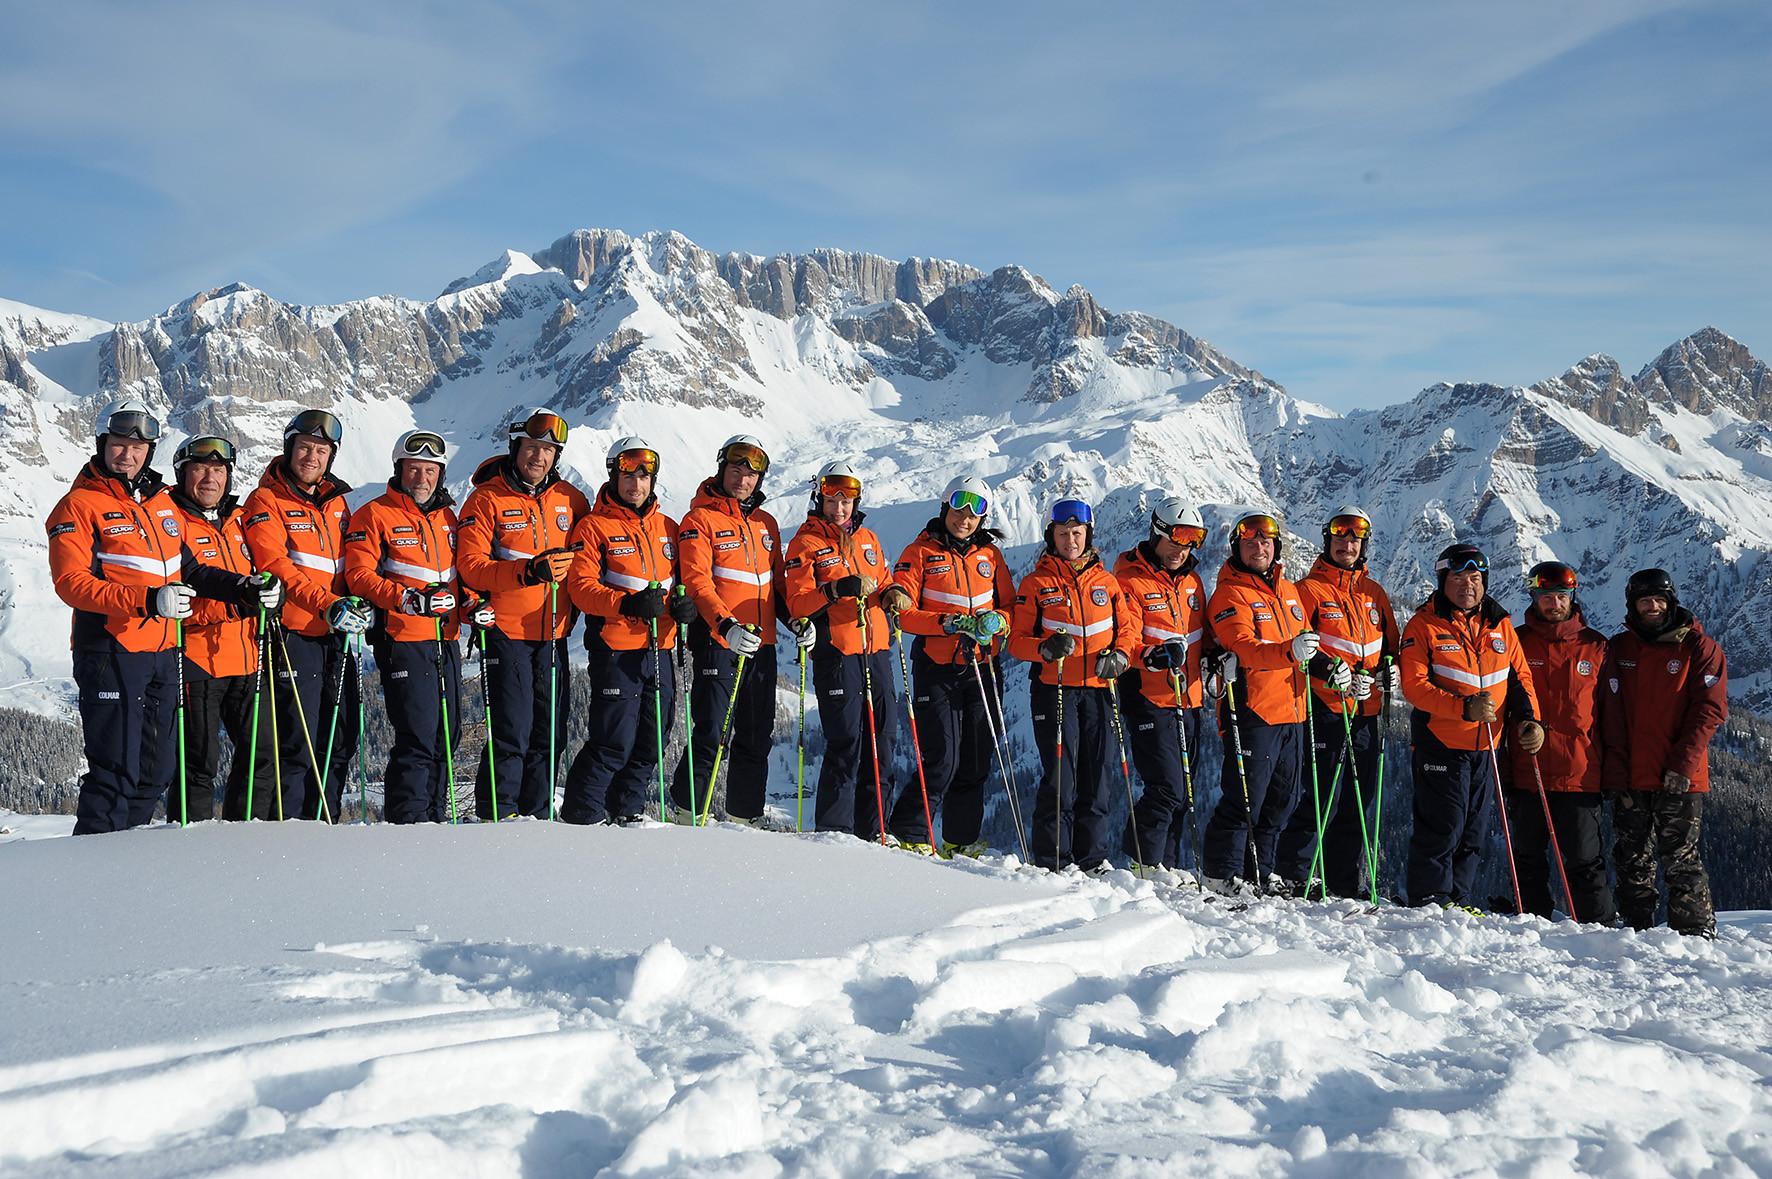 Lezione privata di sci per mini-gruppi di tutti i livelli a Falcade